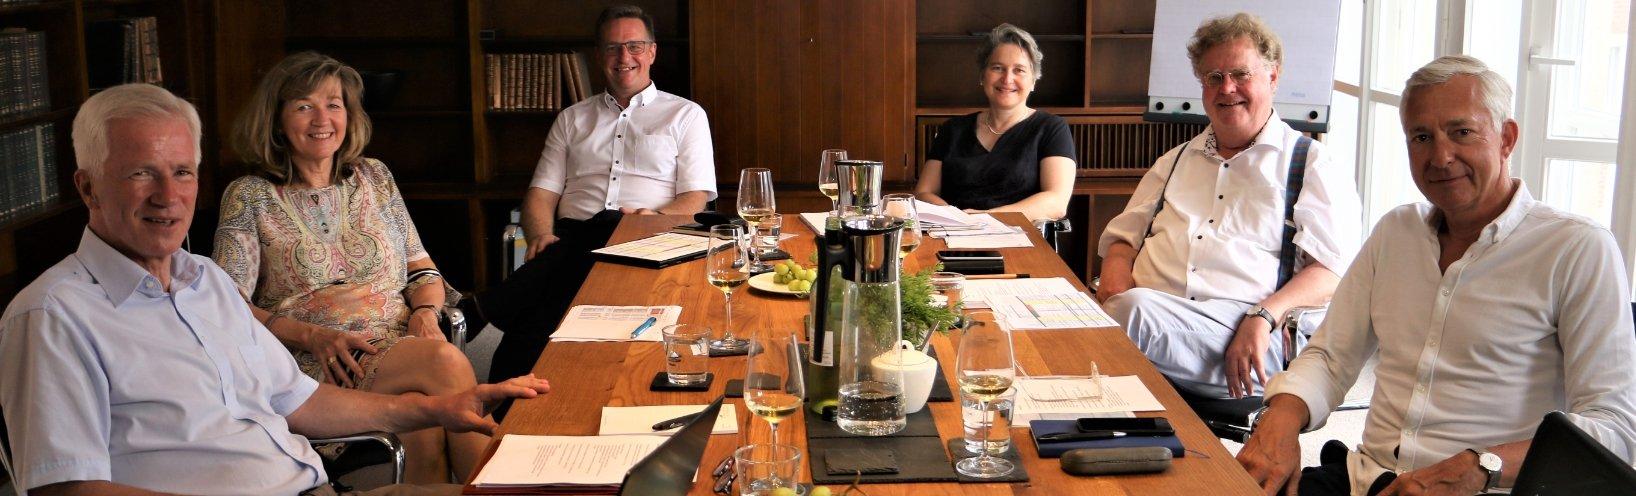 v.l.: Hans-Peter Kosmider (Vorstandsvorsitzender), Margarete Kordt, Prof. Dr. Thorn Kring, Anne Leusmann, Dr. Jörg Bockow, Hermann-Josef Mergen.